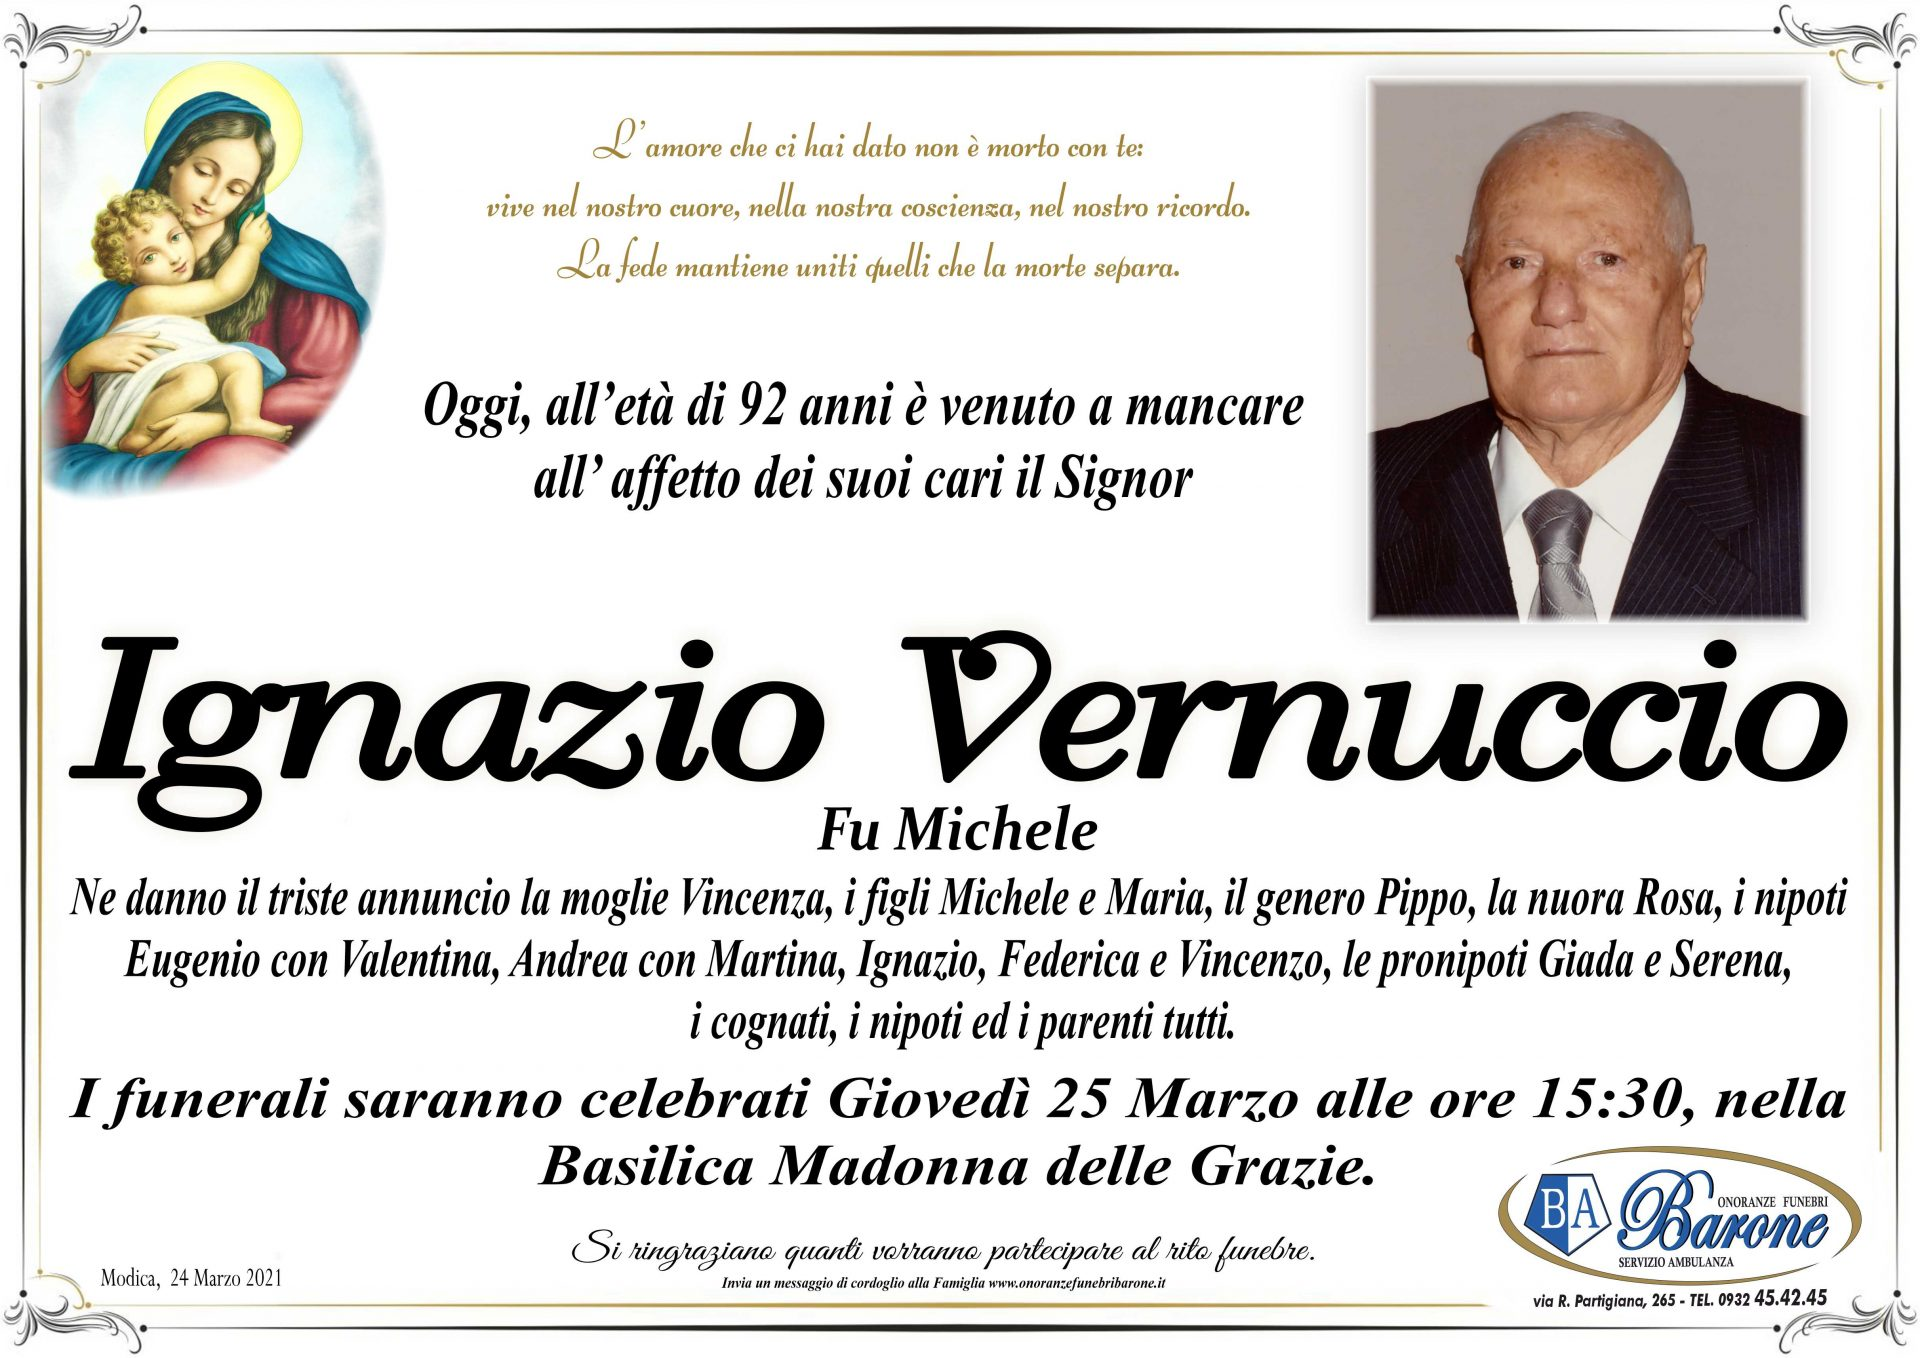 Ignazio Vernuccio